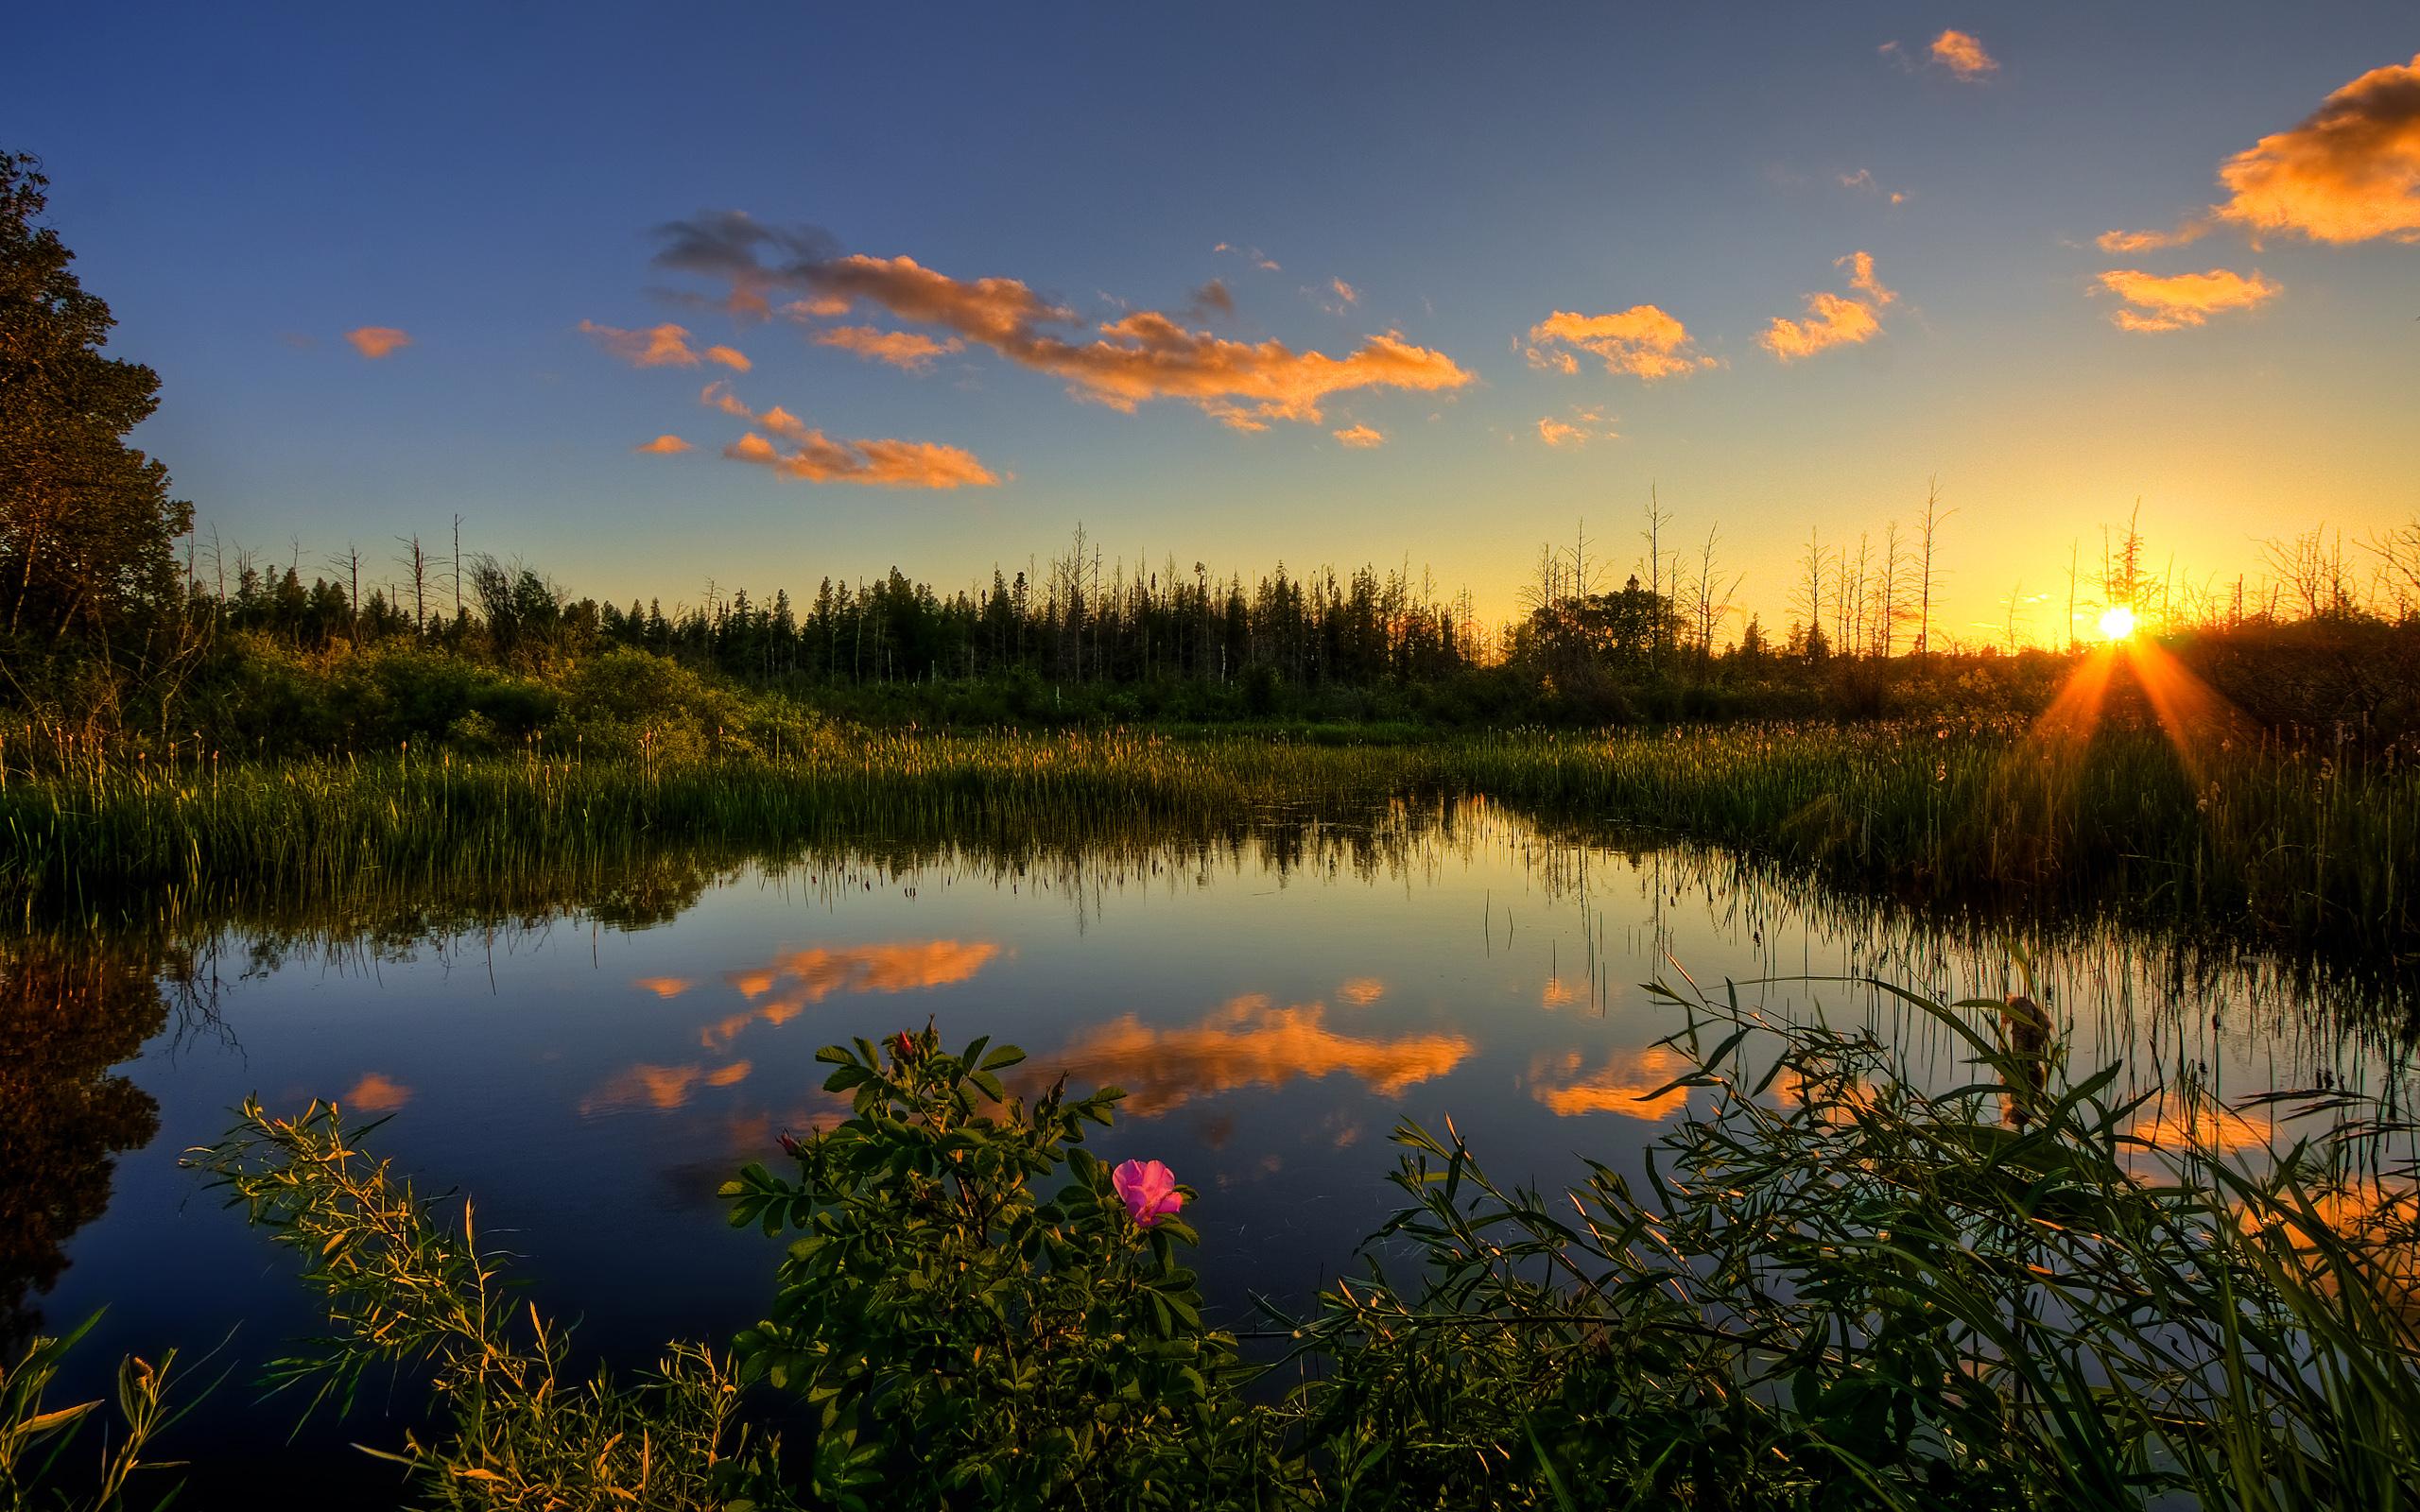 трава, болото, пруд